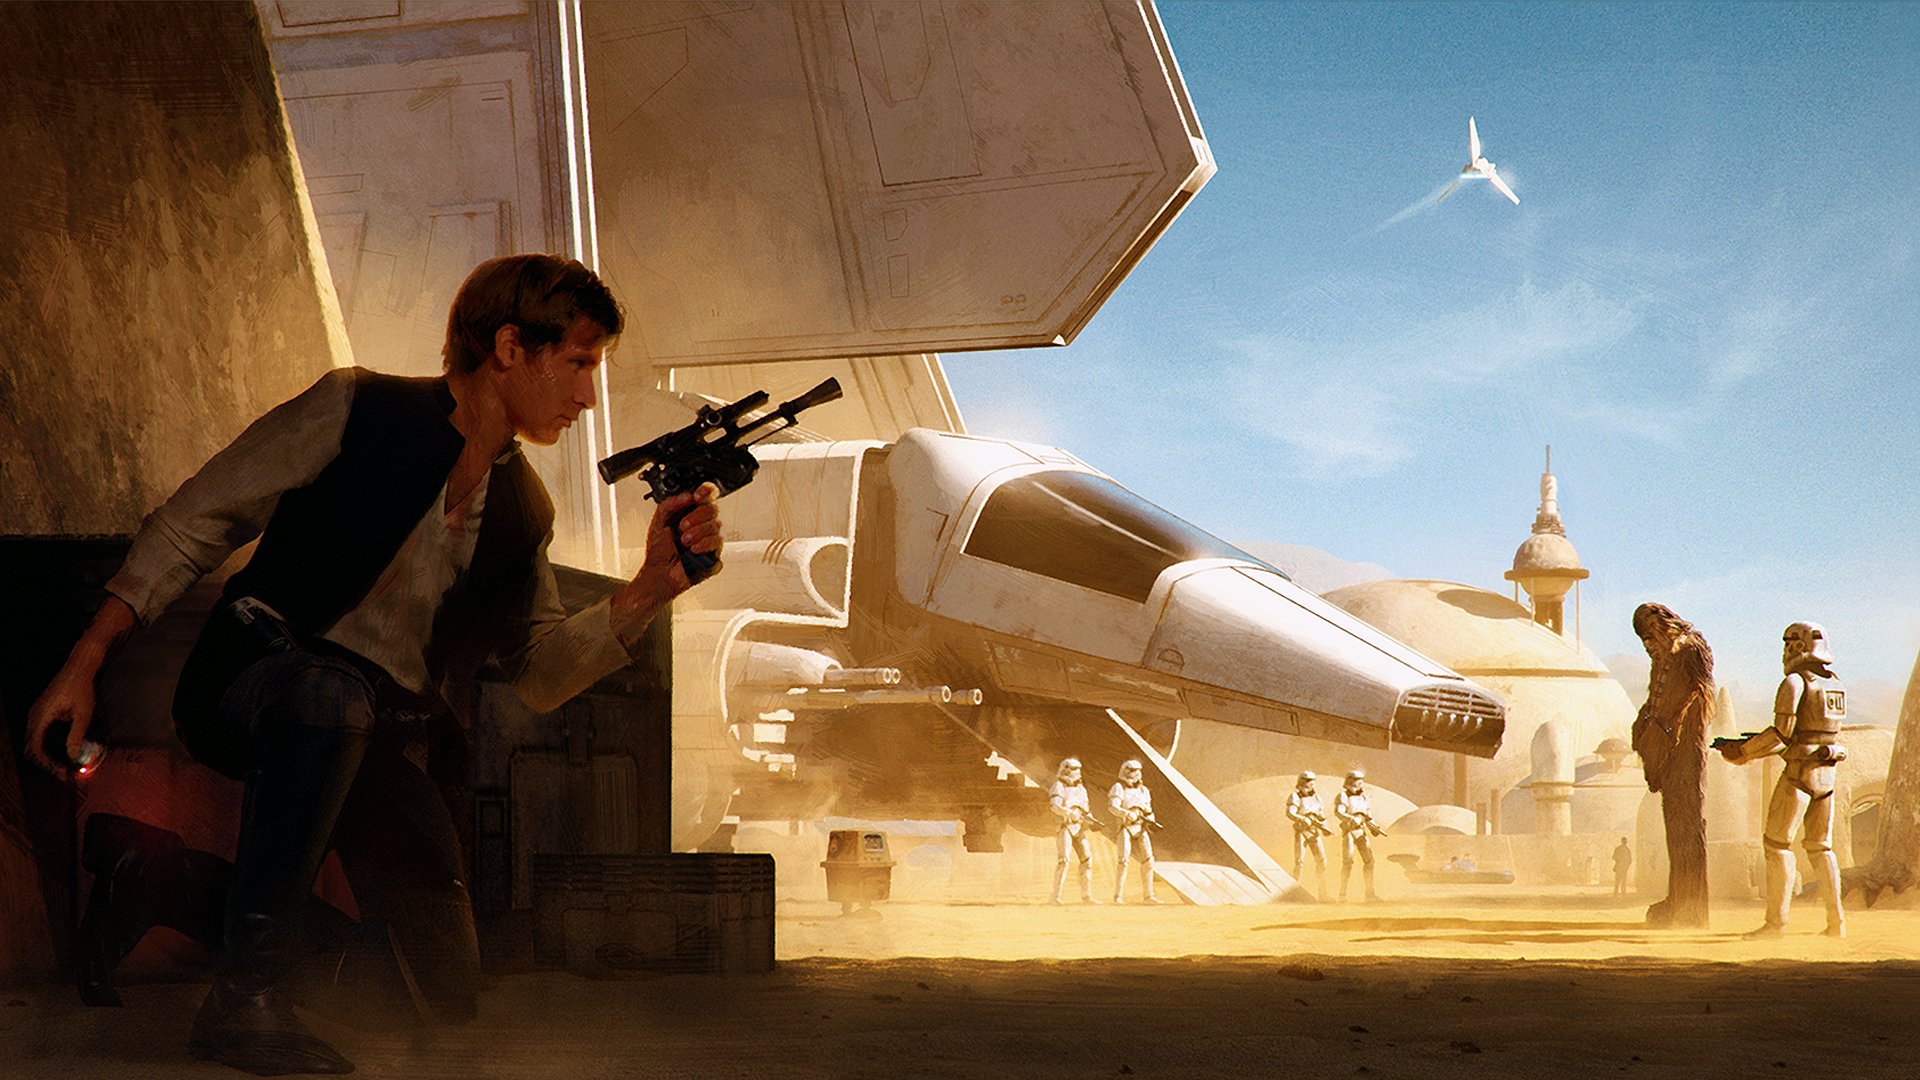 General 1920x1080 digital art artwork Star Wars Han Solo Chewbacca science fiction spaceship movie characters soldier stormtrooper Wojtek Fus